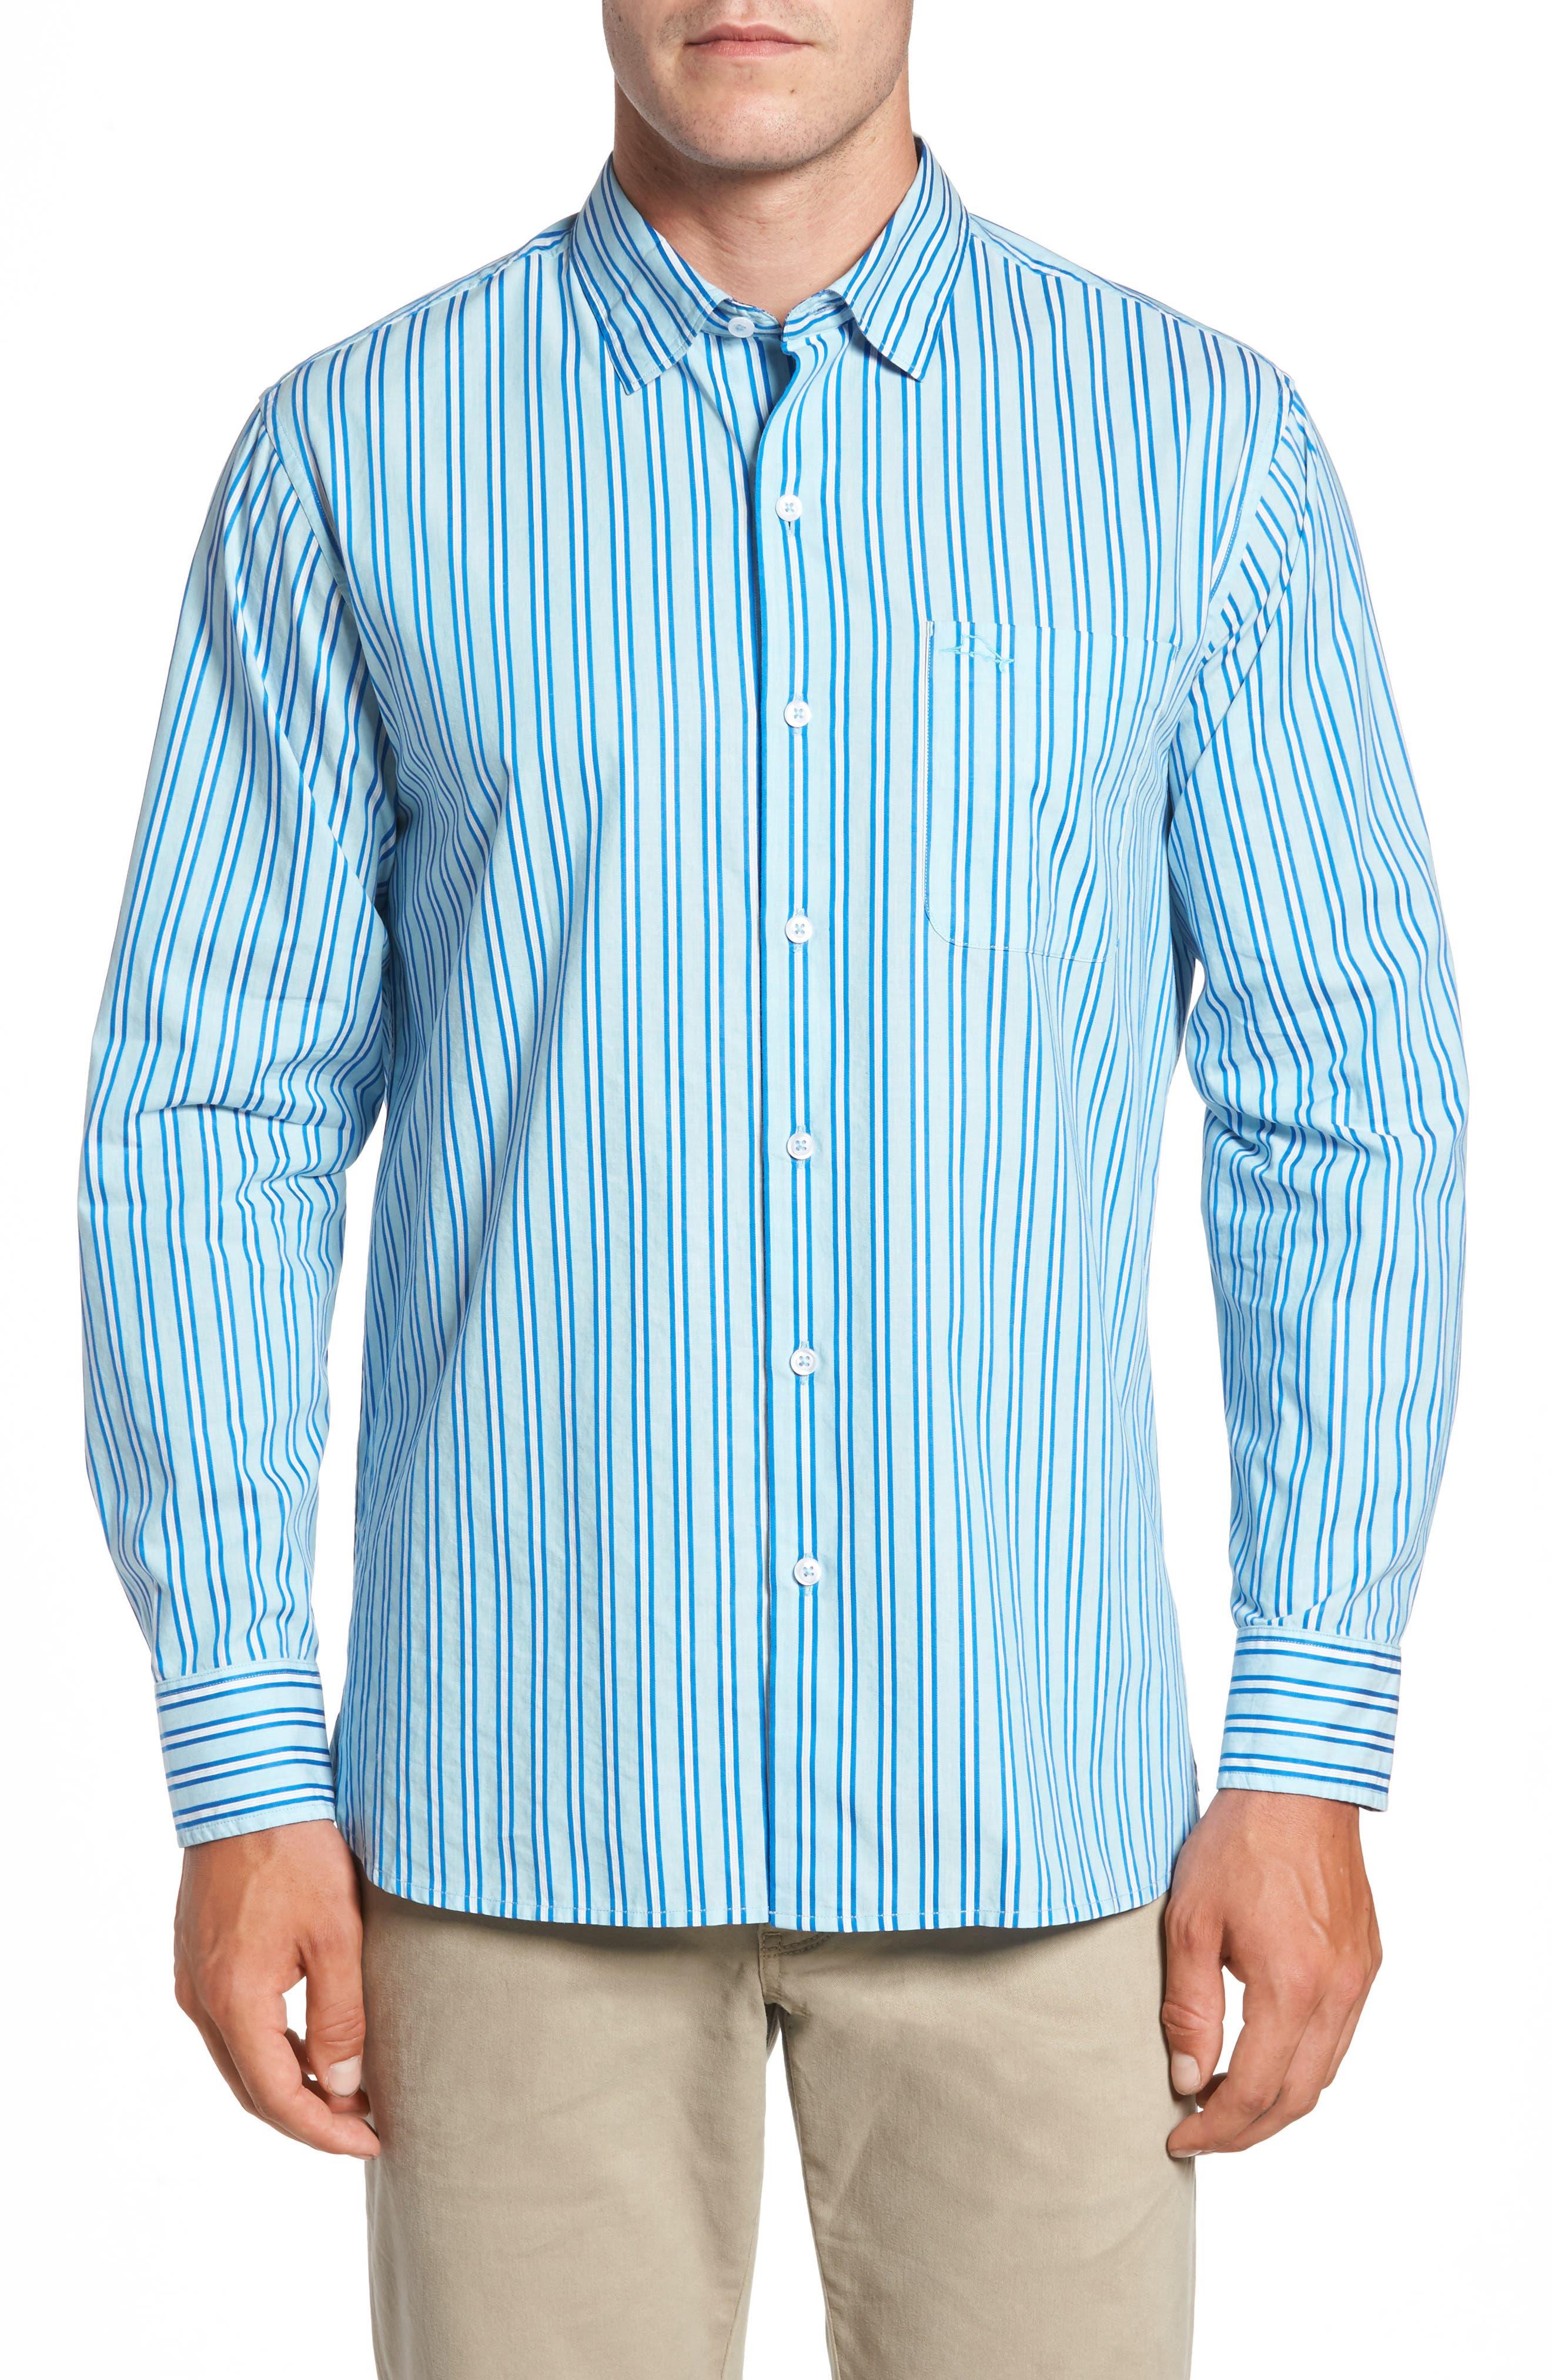 Surf the Line Stripe Sport Shirt,                         Main,                         color, 400